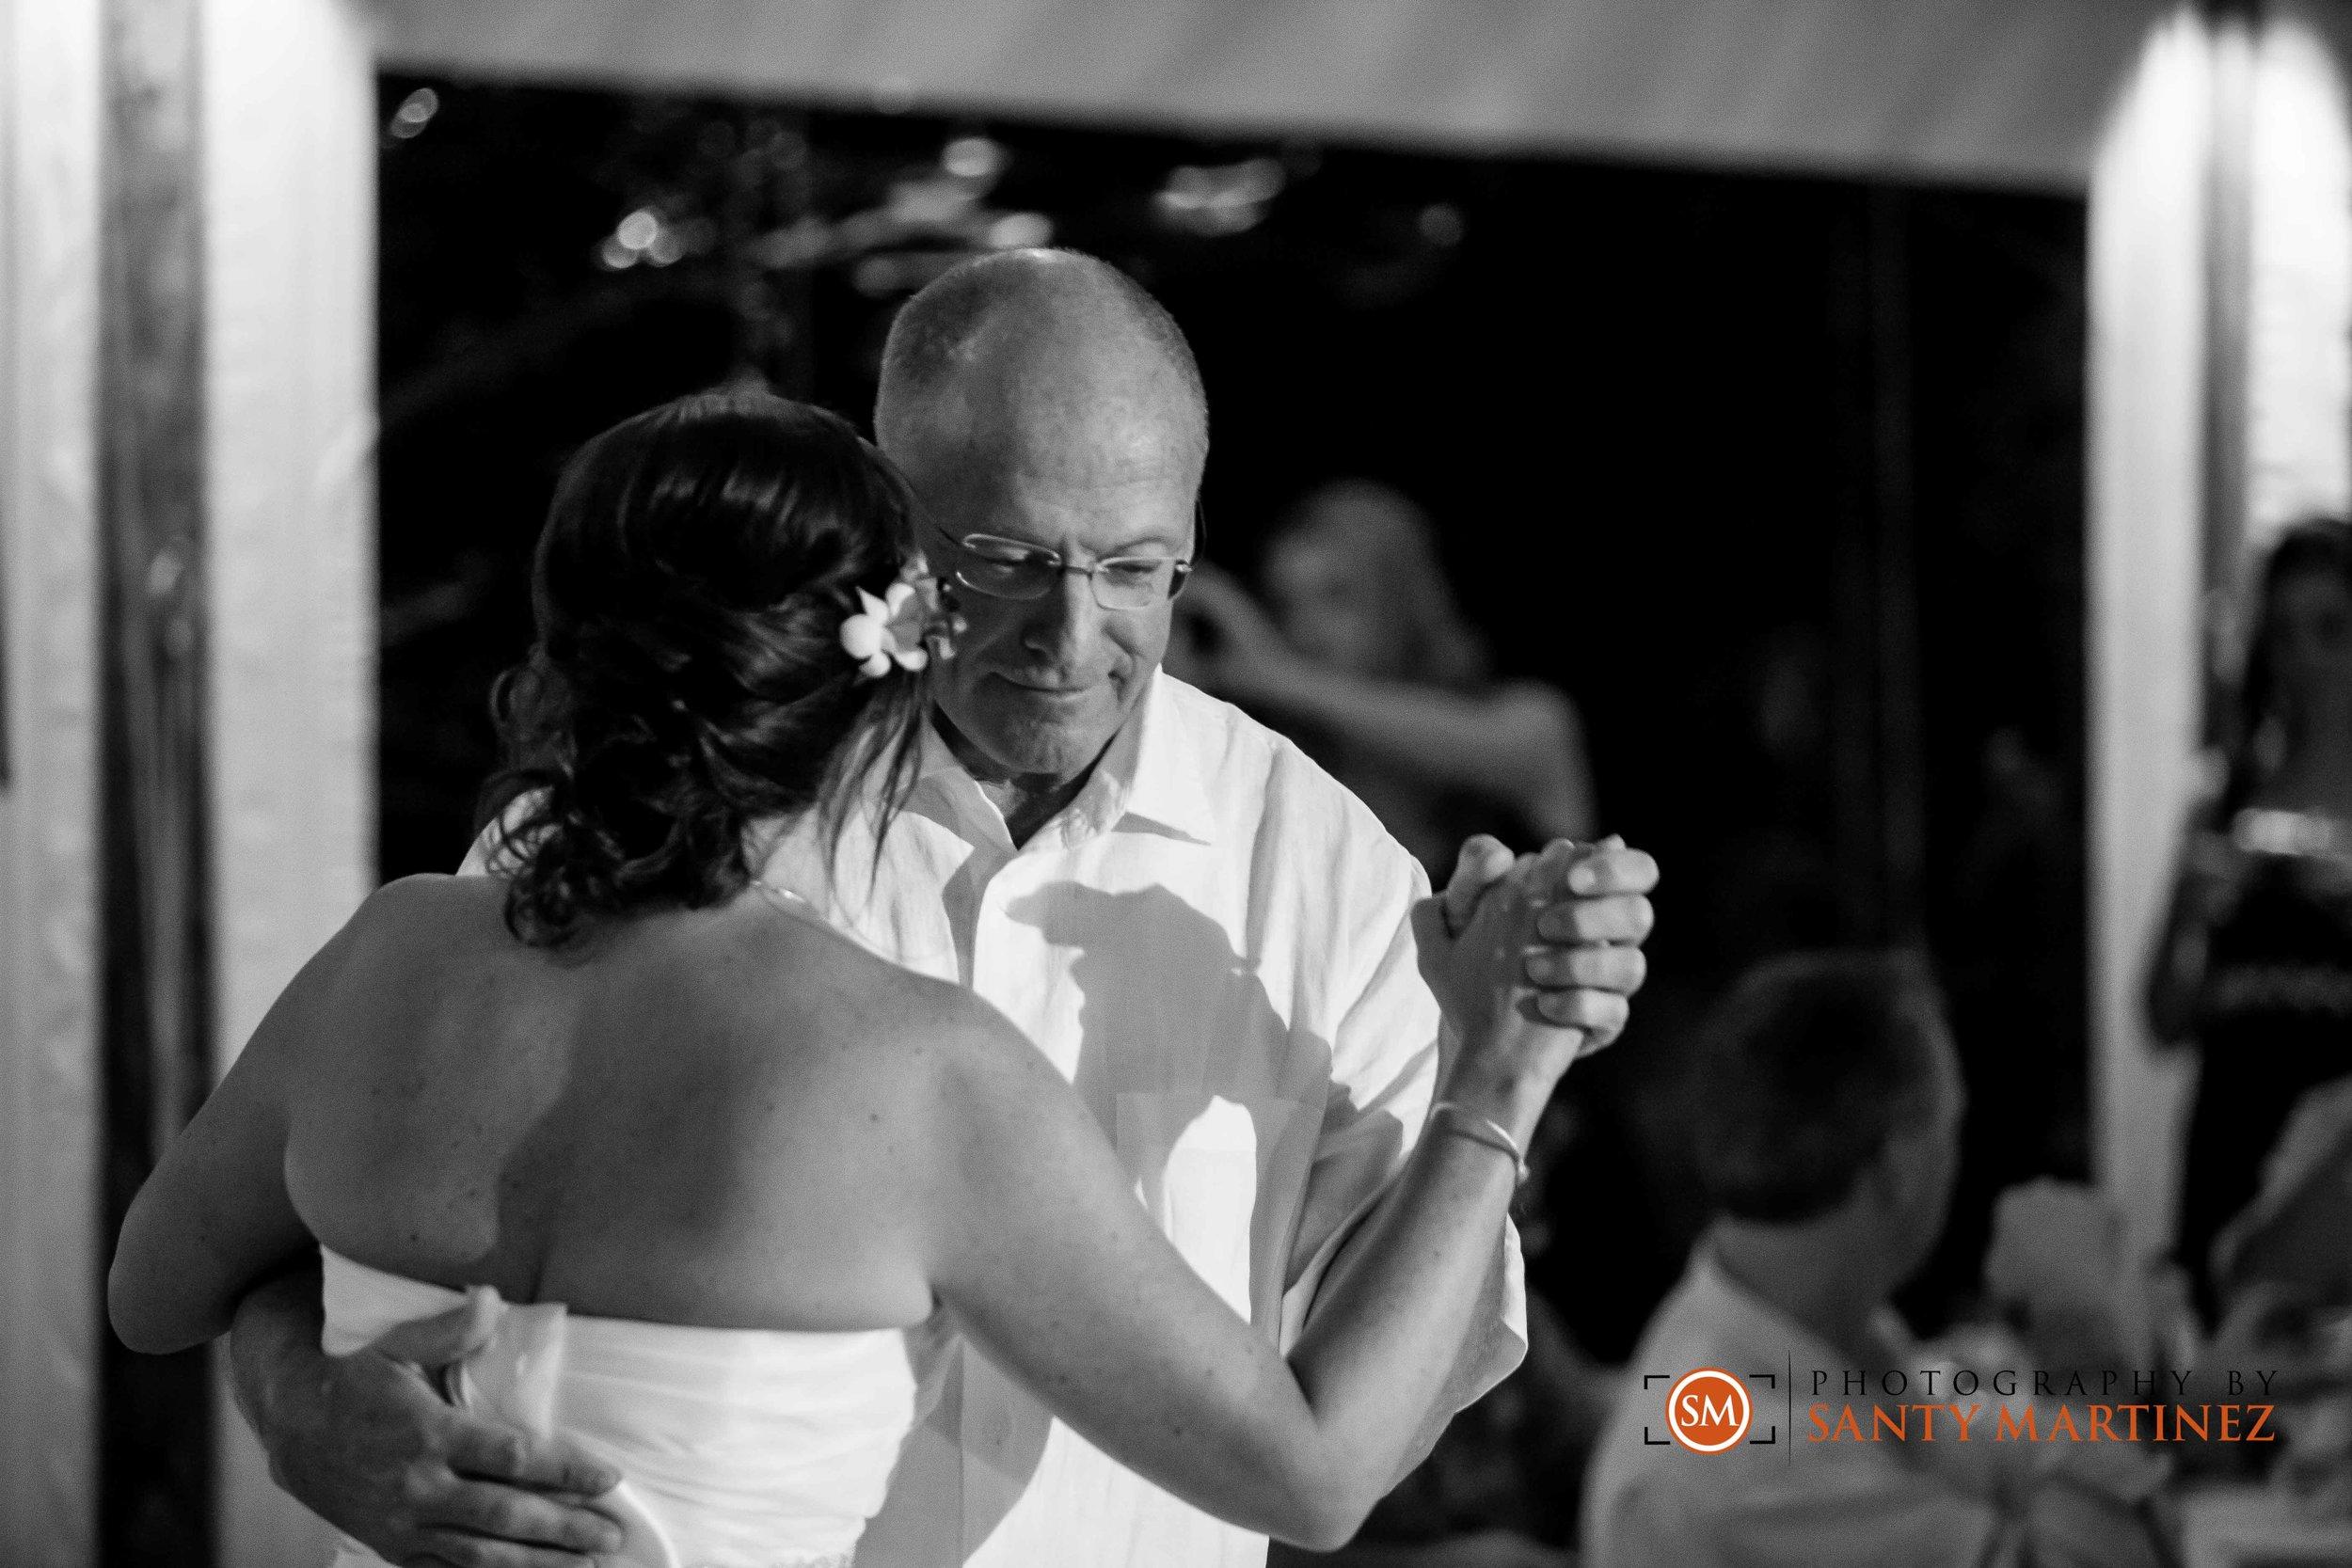 Photography by Santy Martinez - Miami Wedding Photographer-046-1.jpg